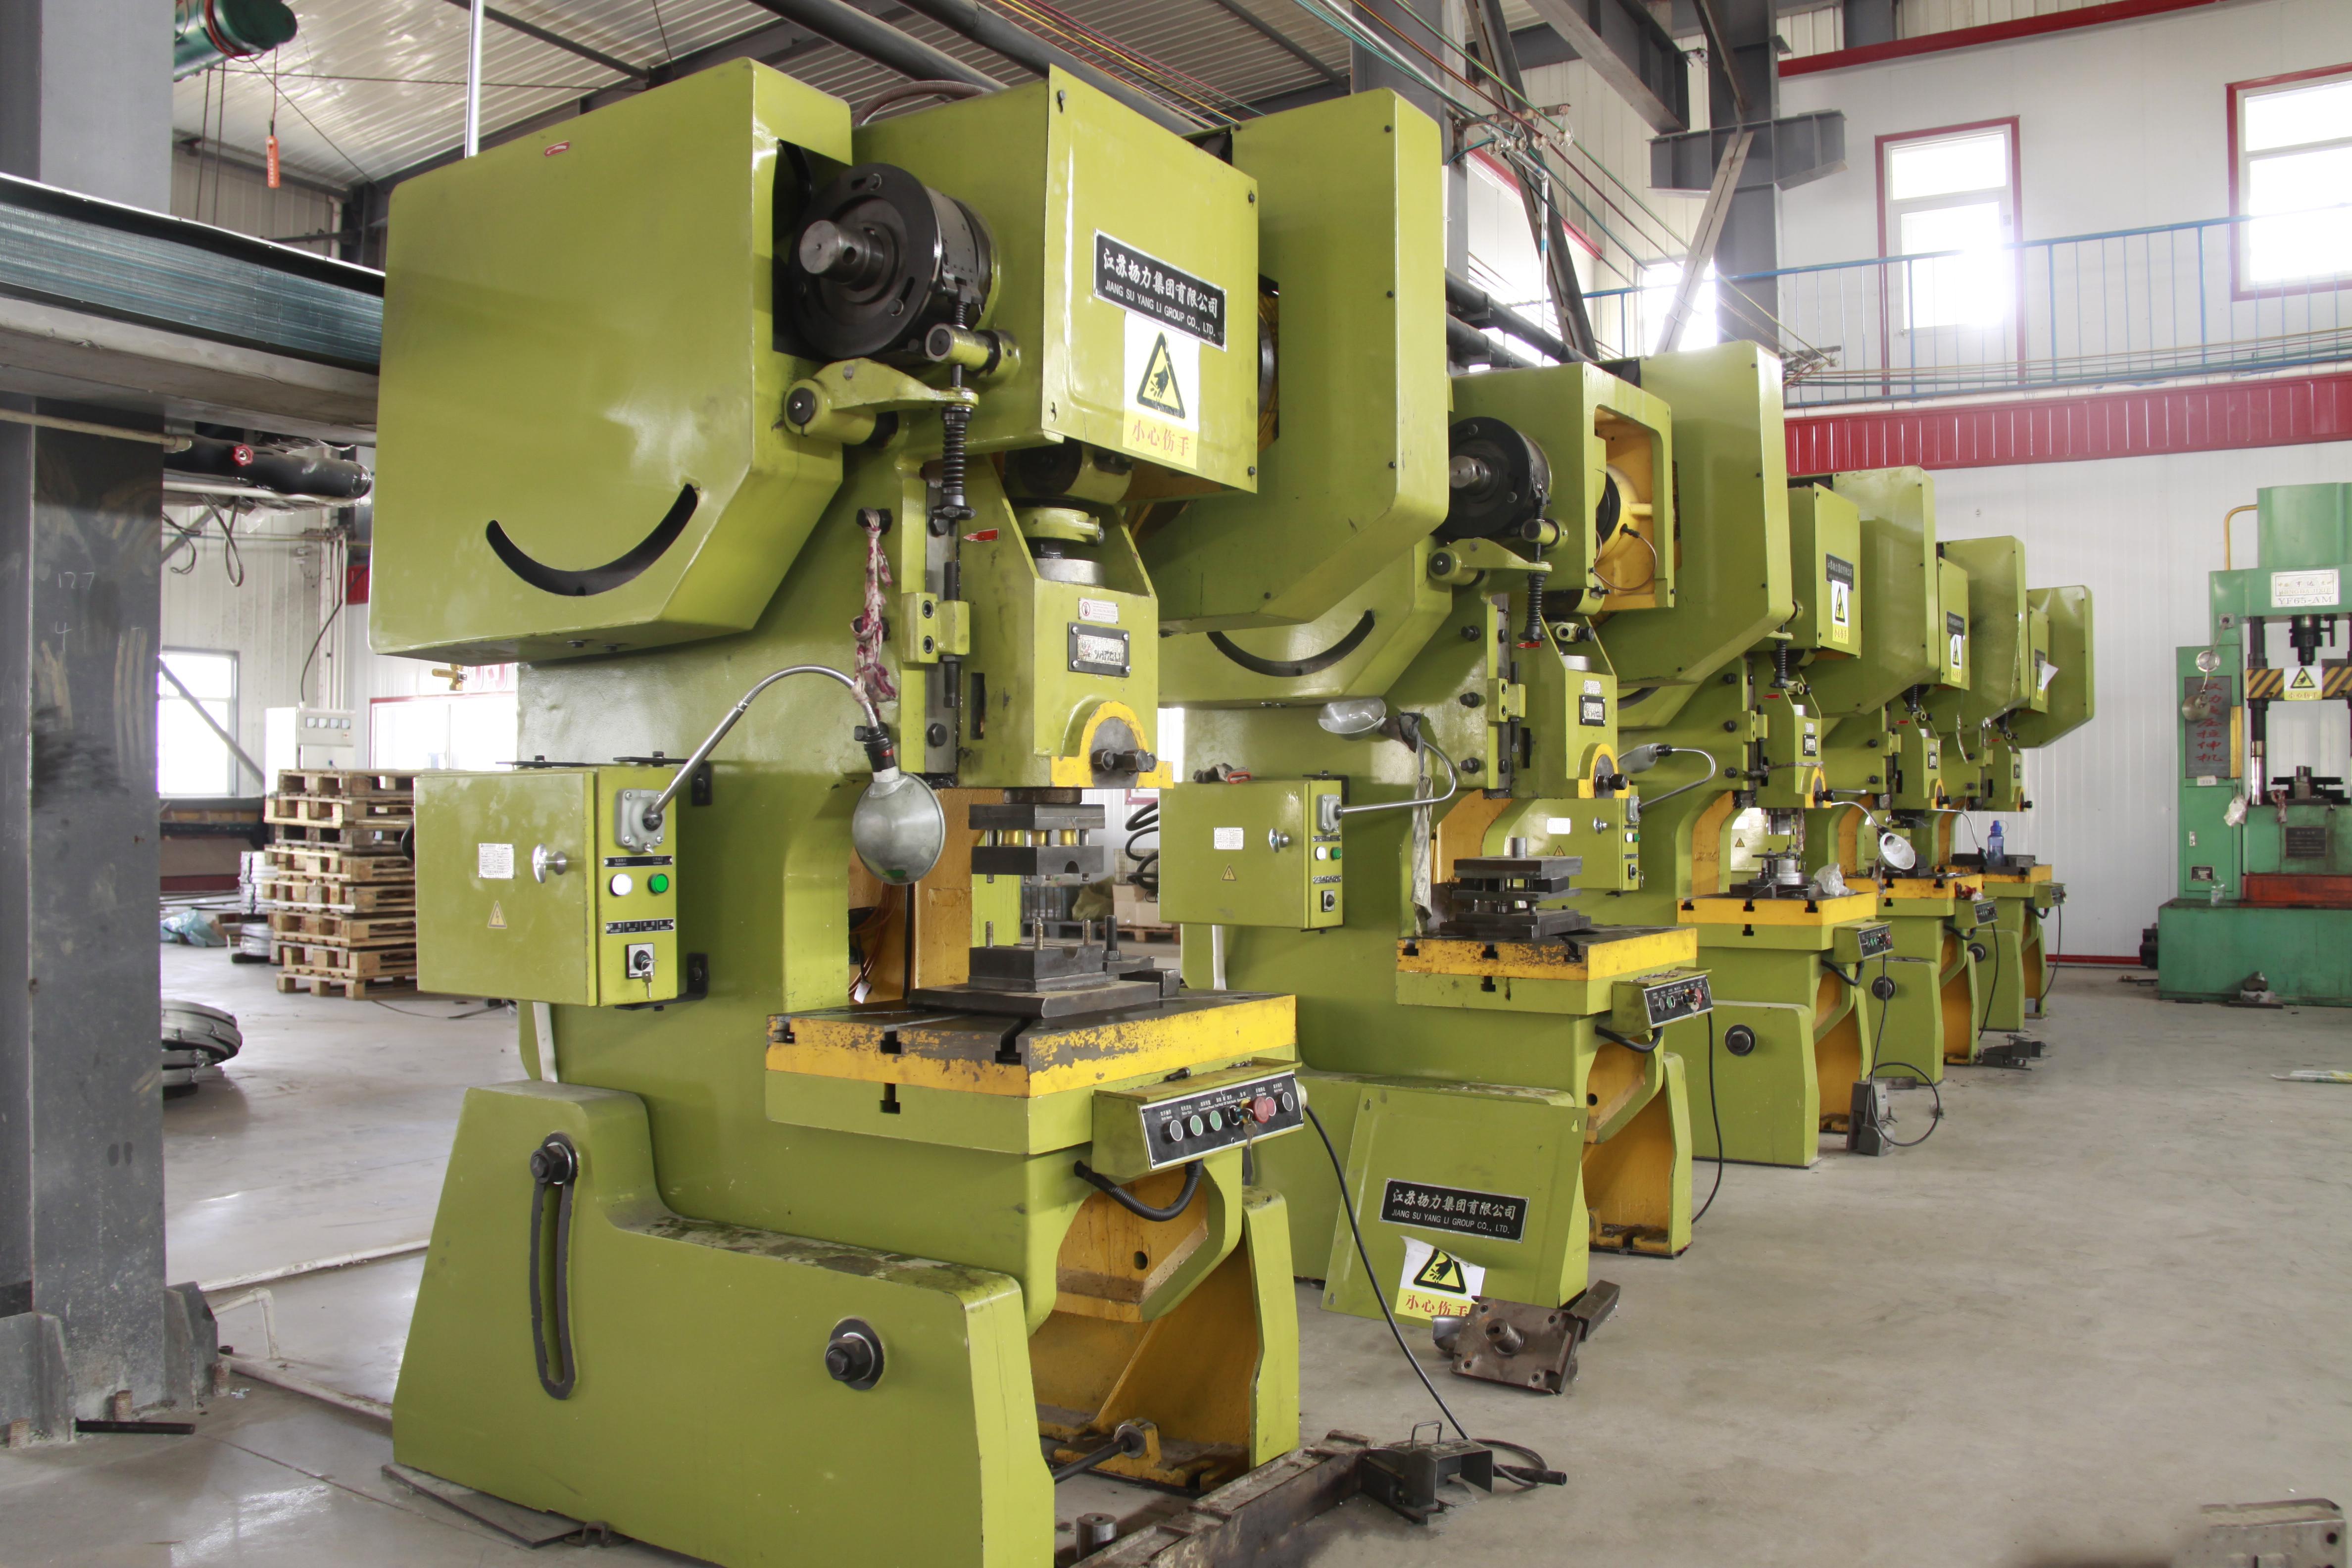 Progressive Stamping machines